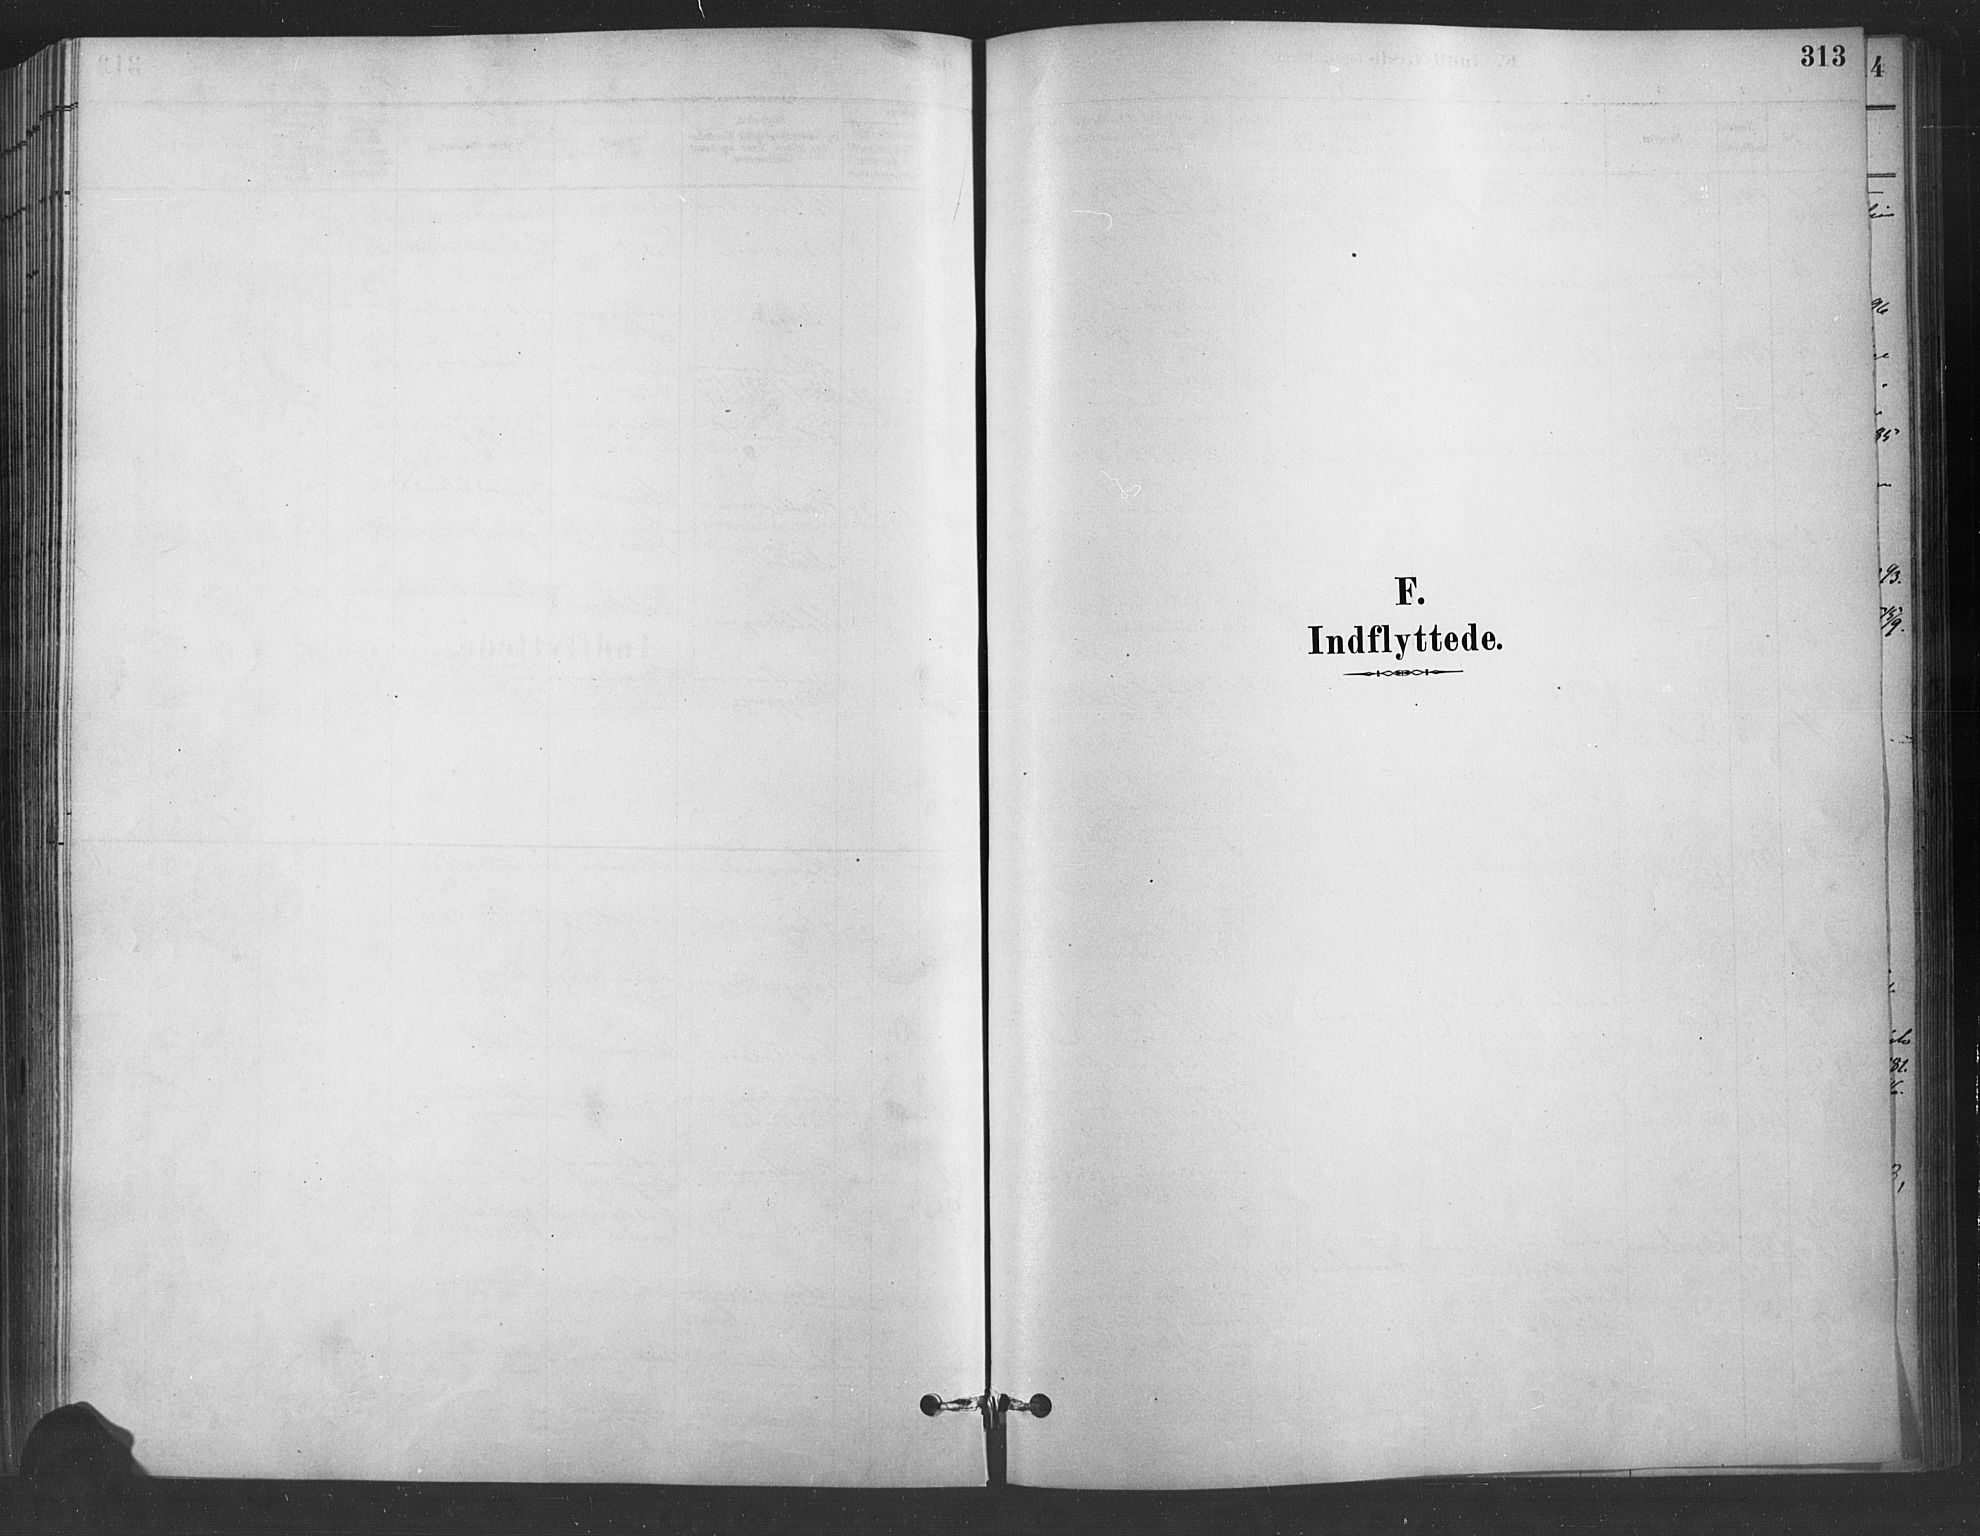 SAH, Fåberg prestekontor, Ministerialbok nr. 9, 1879-1898, s. 313